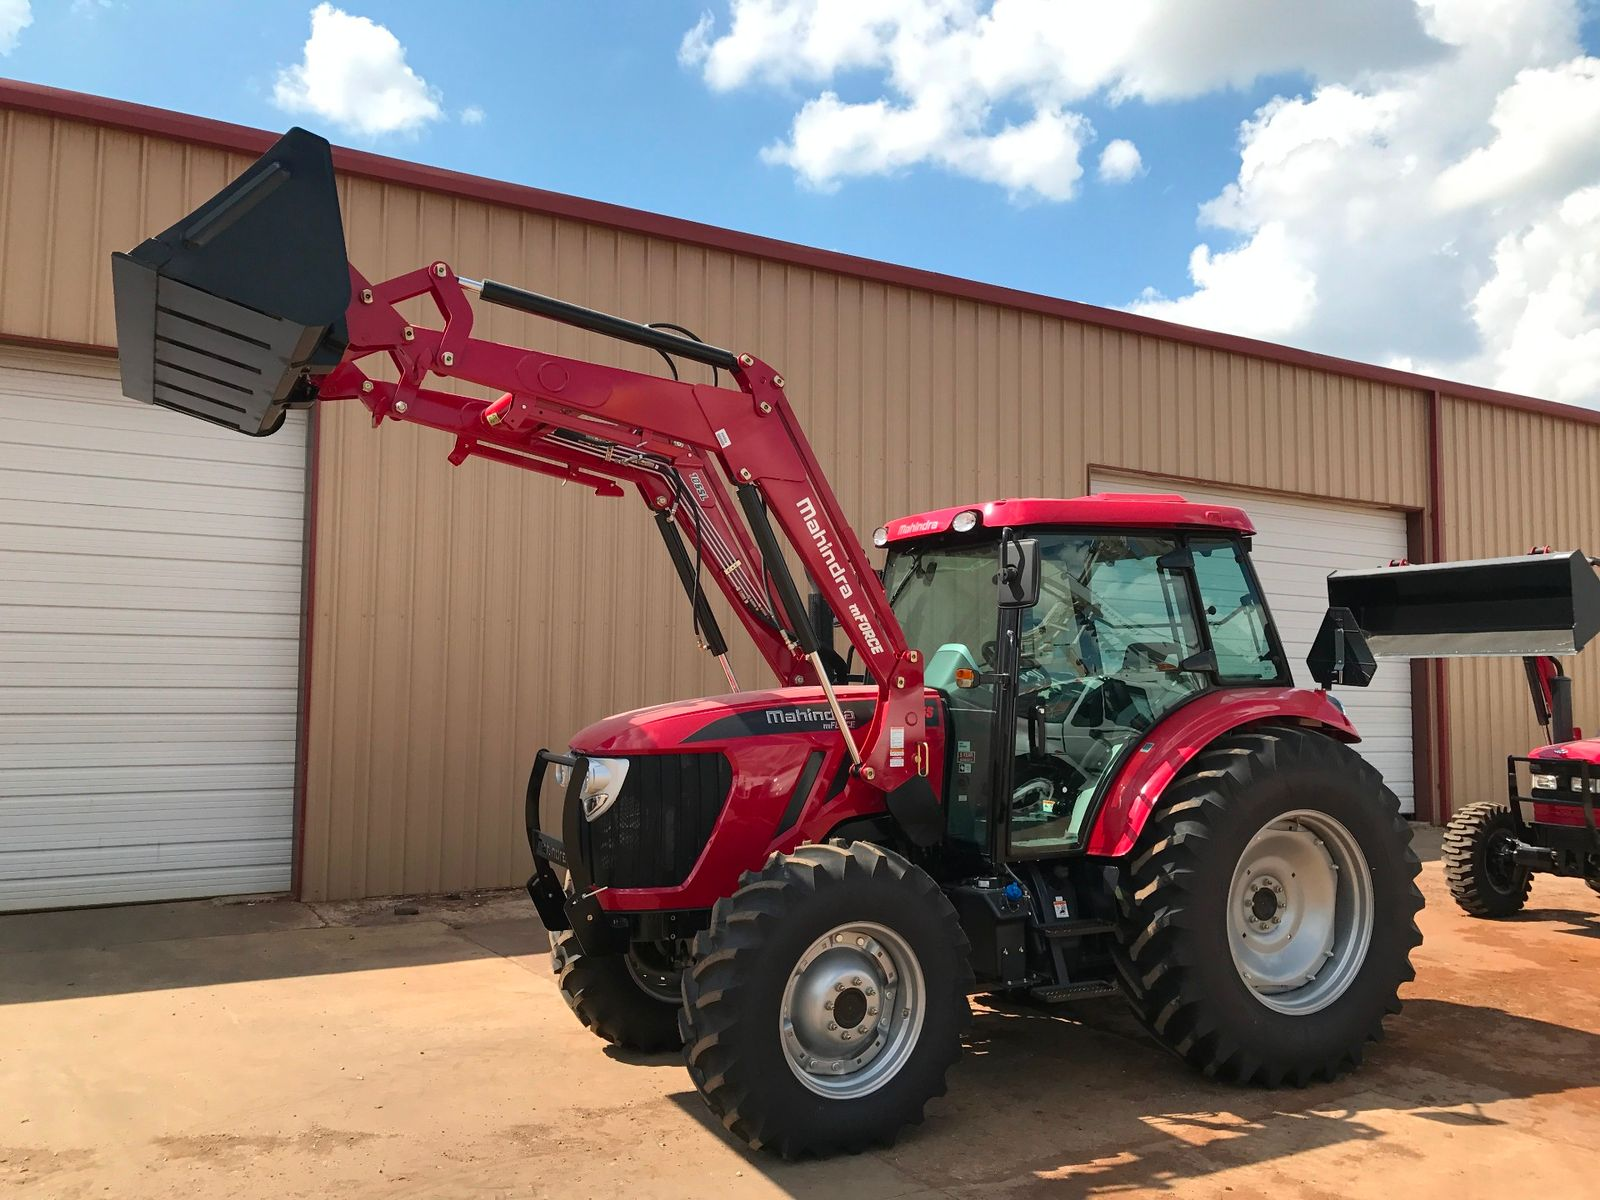 2017 Mahindra 105 Shuttle Wag Tires City Tx North Texas